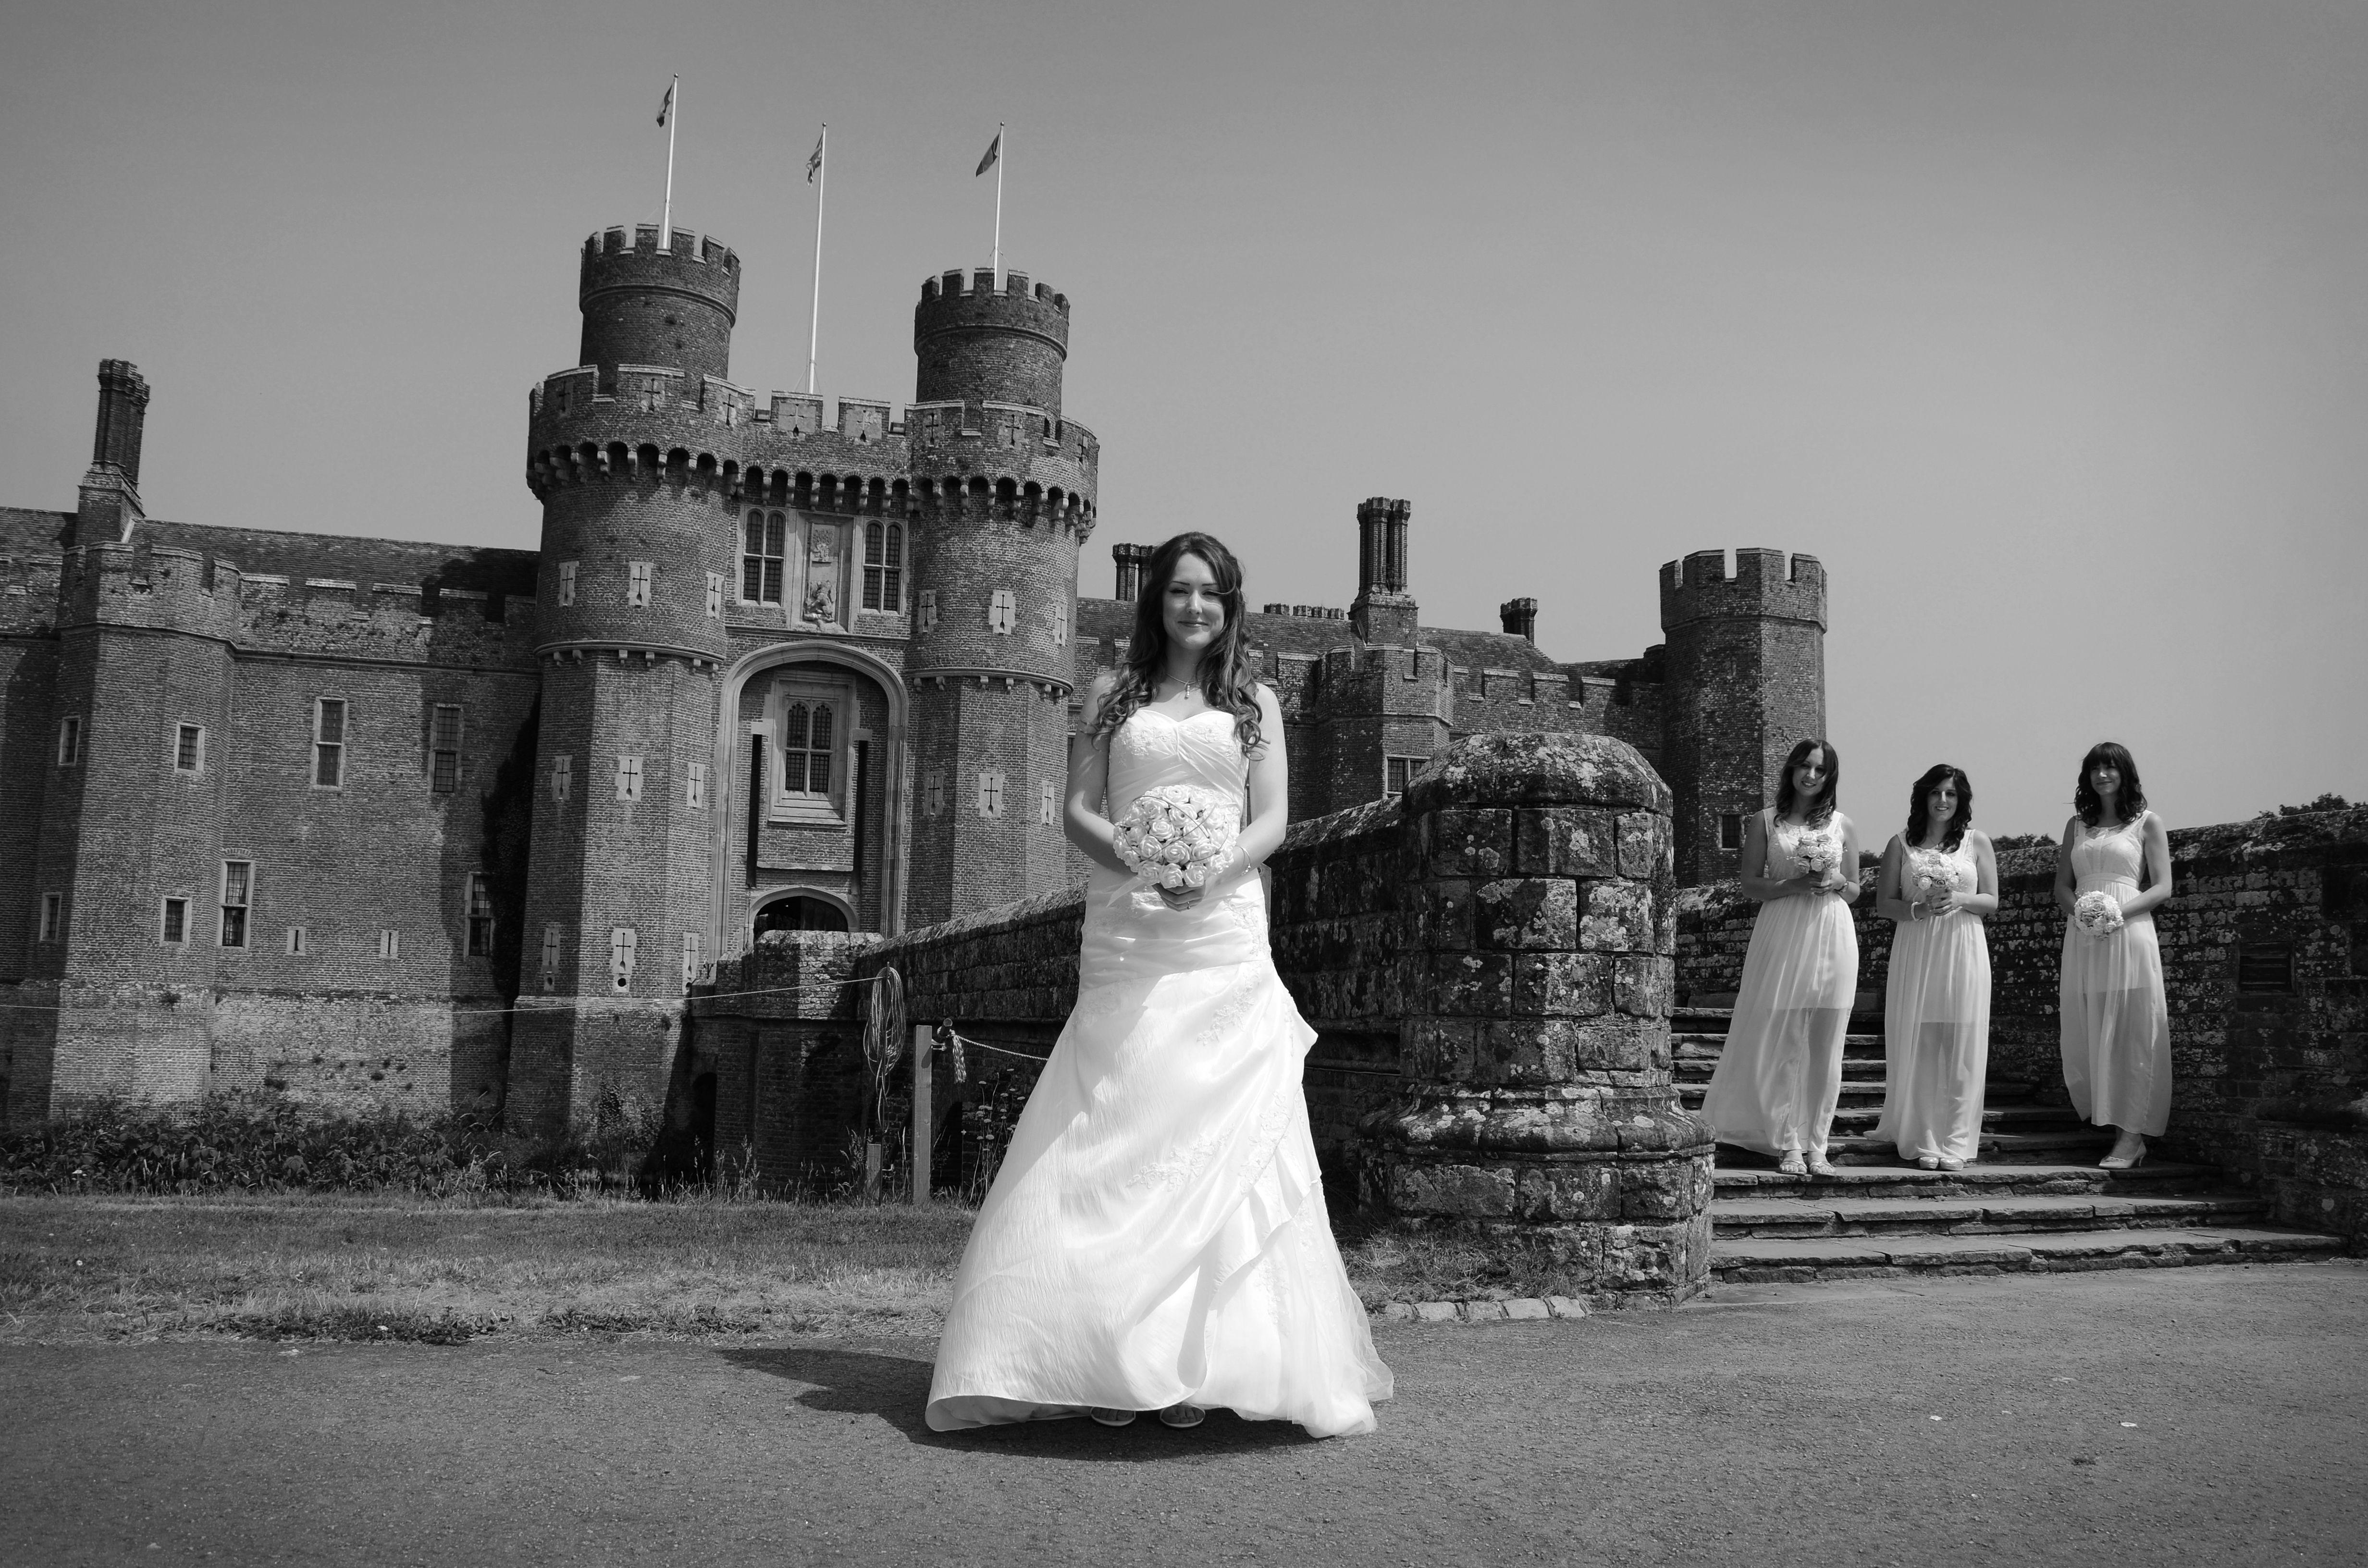 Vintage Wedding Dresses East Sussex: Win A Celsius XXL 0ºF Luxury Sleeping Bag From TETON